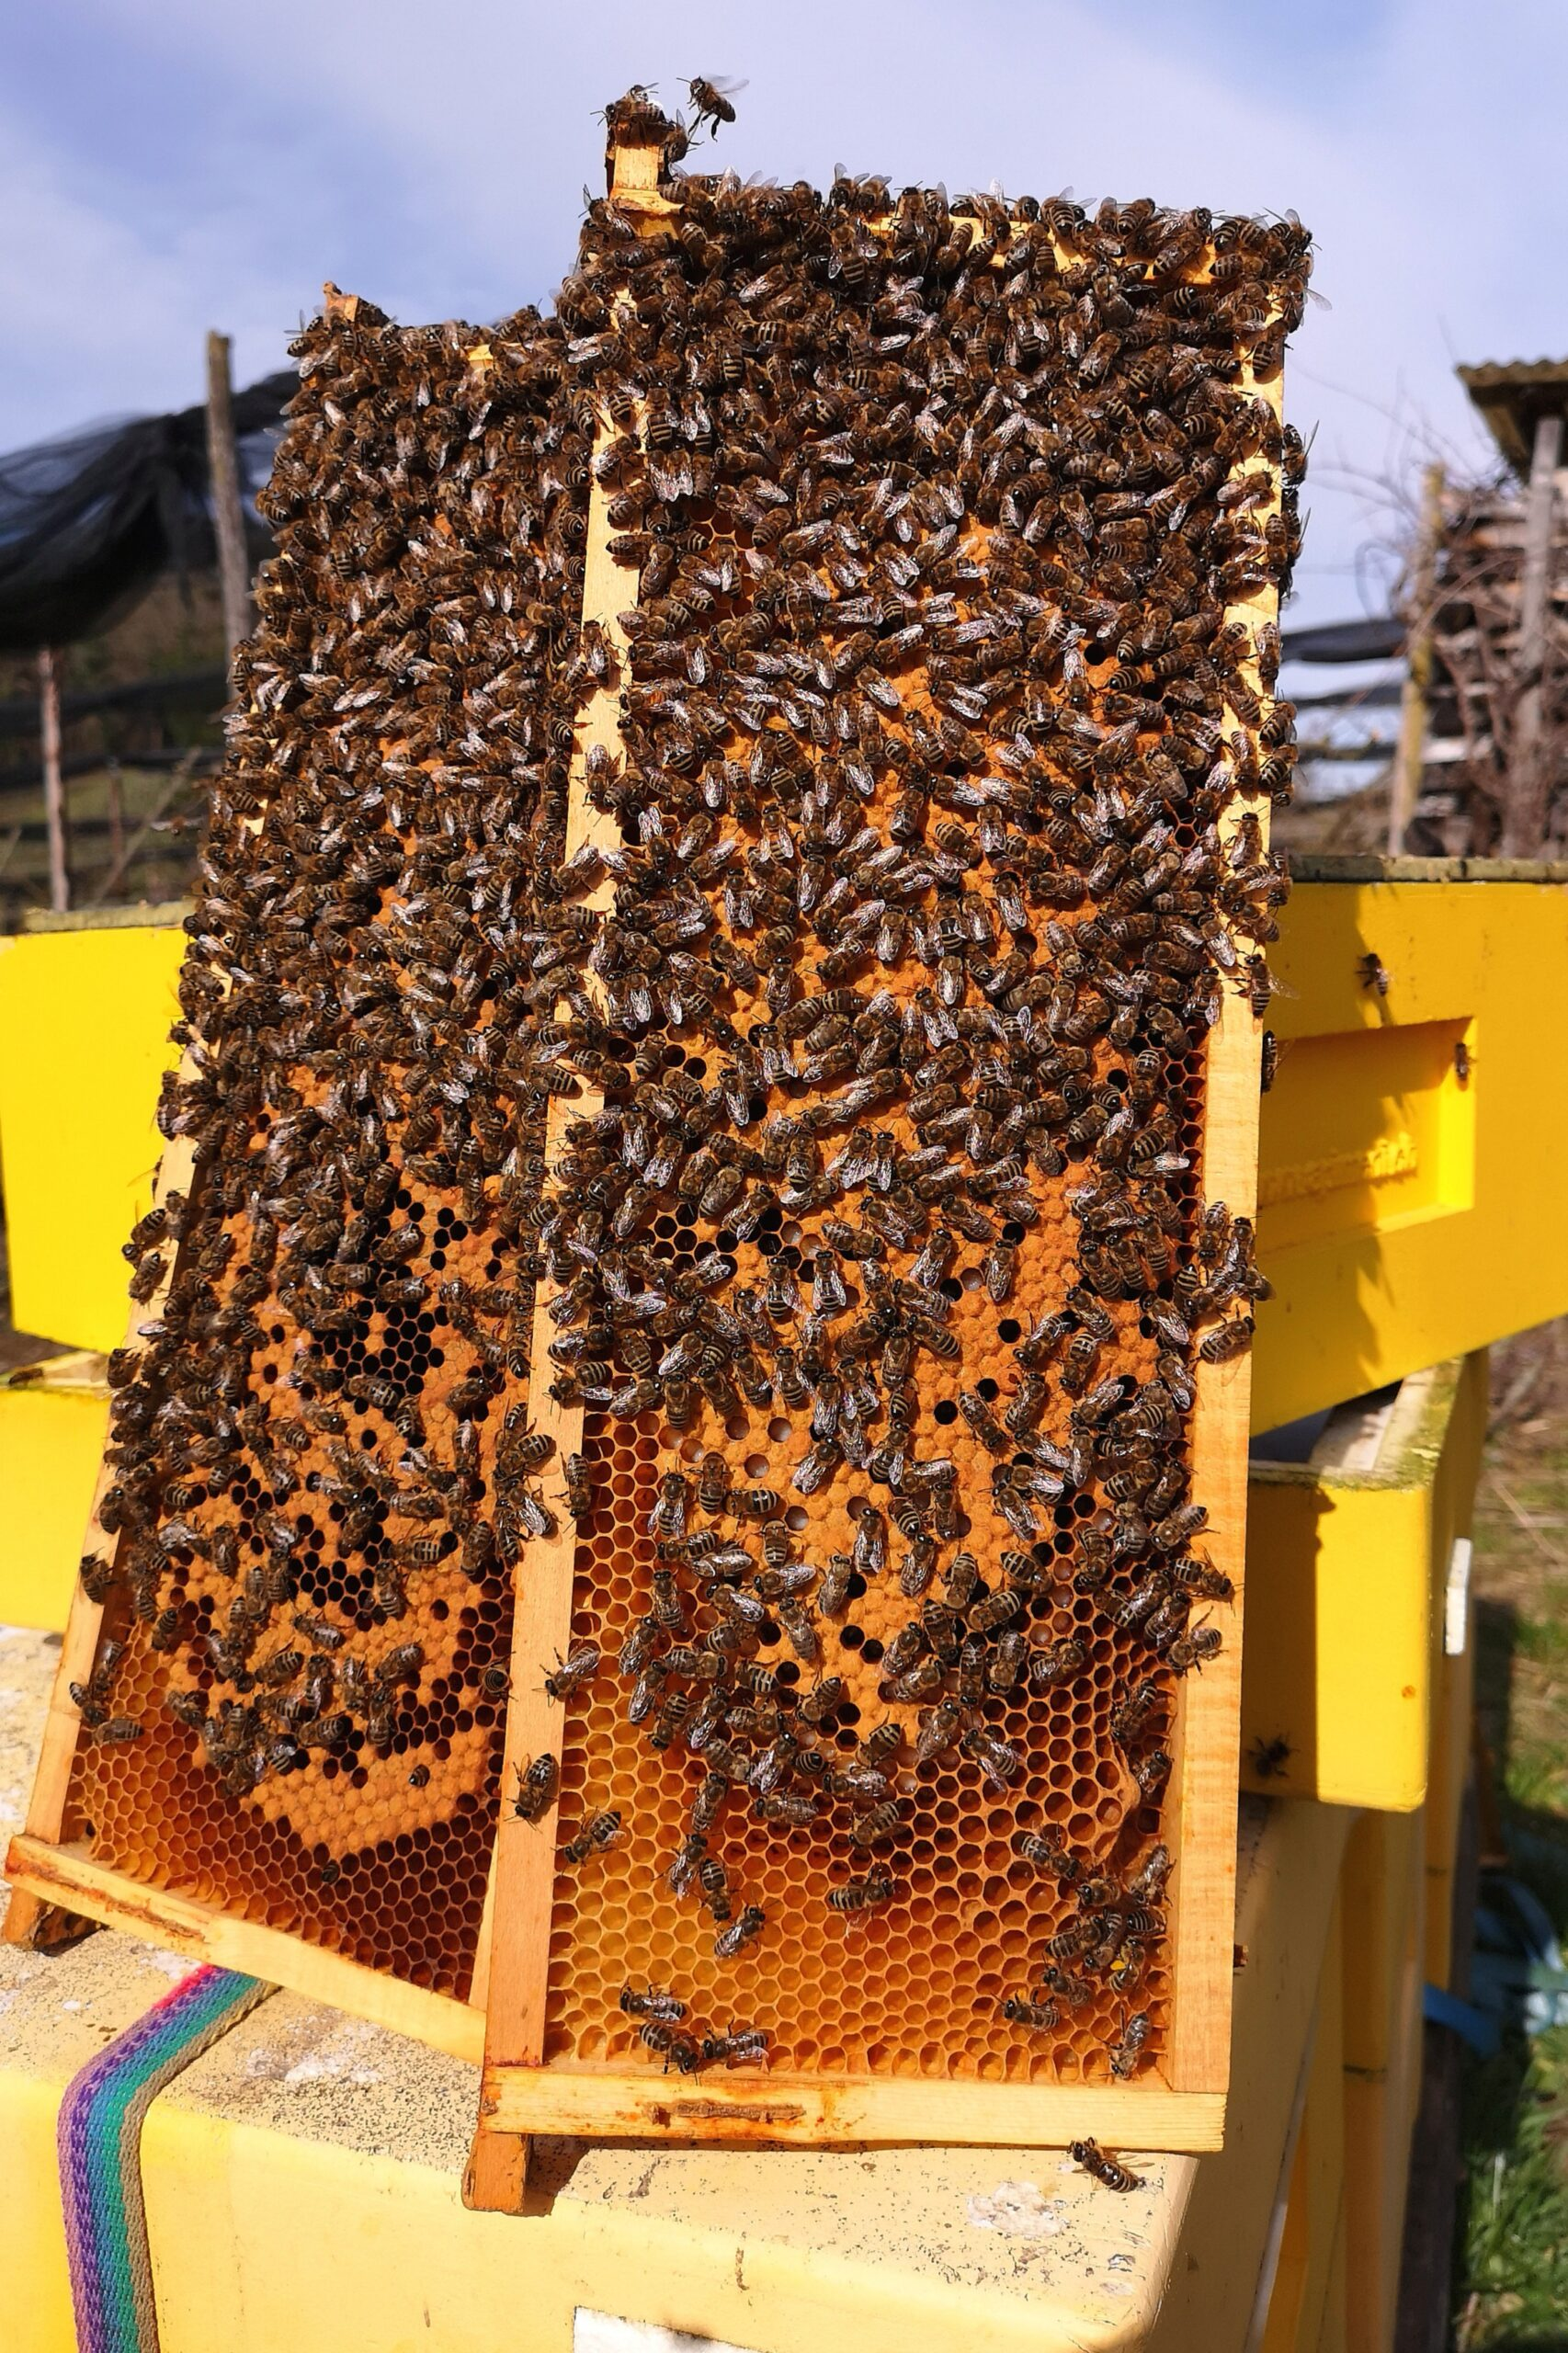 Auswinterung der Bienenvölker